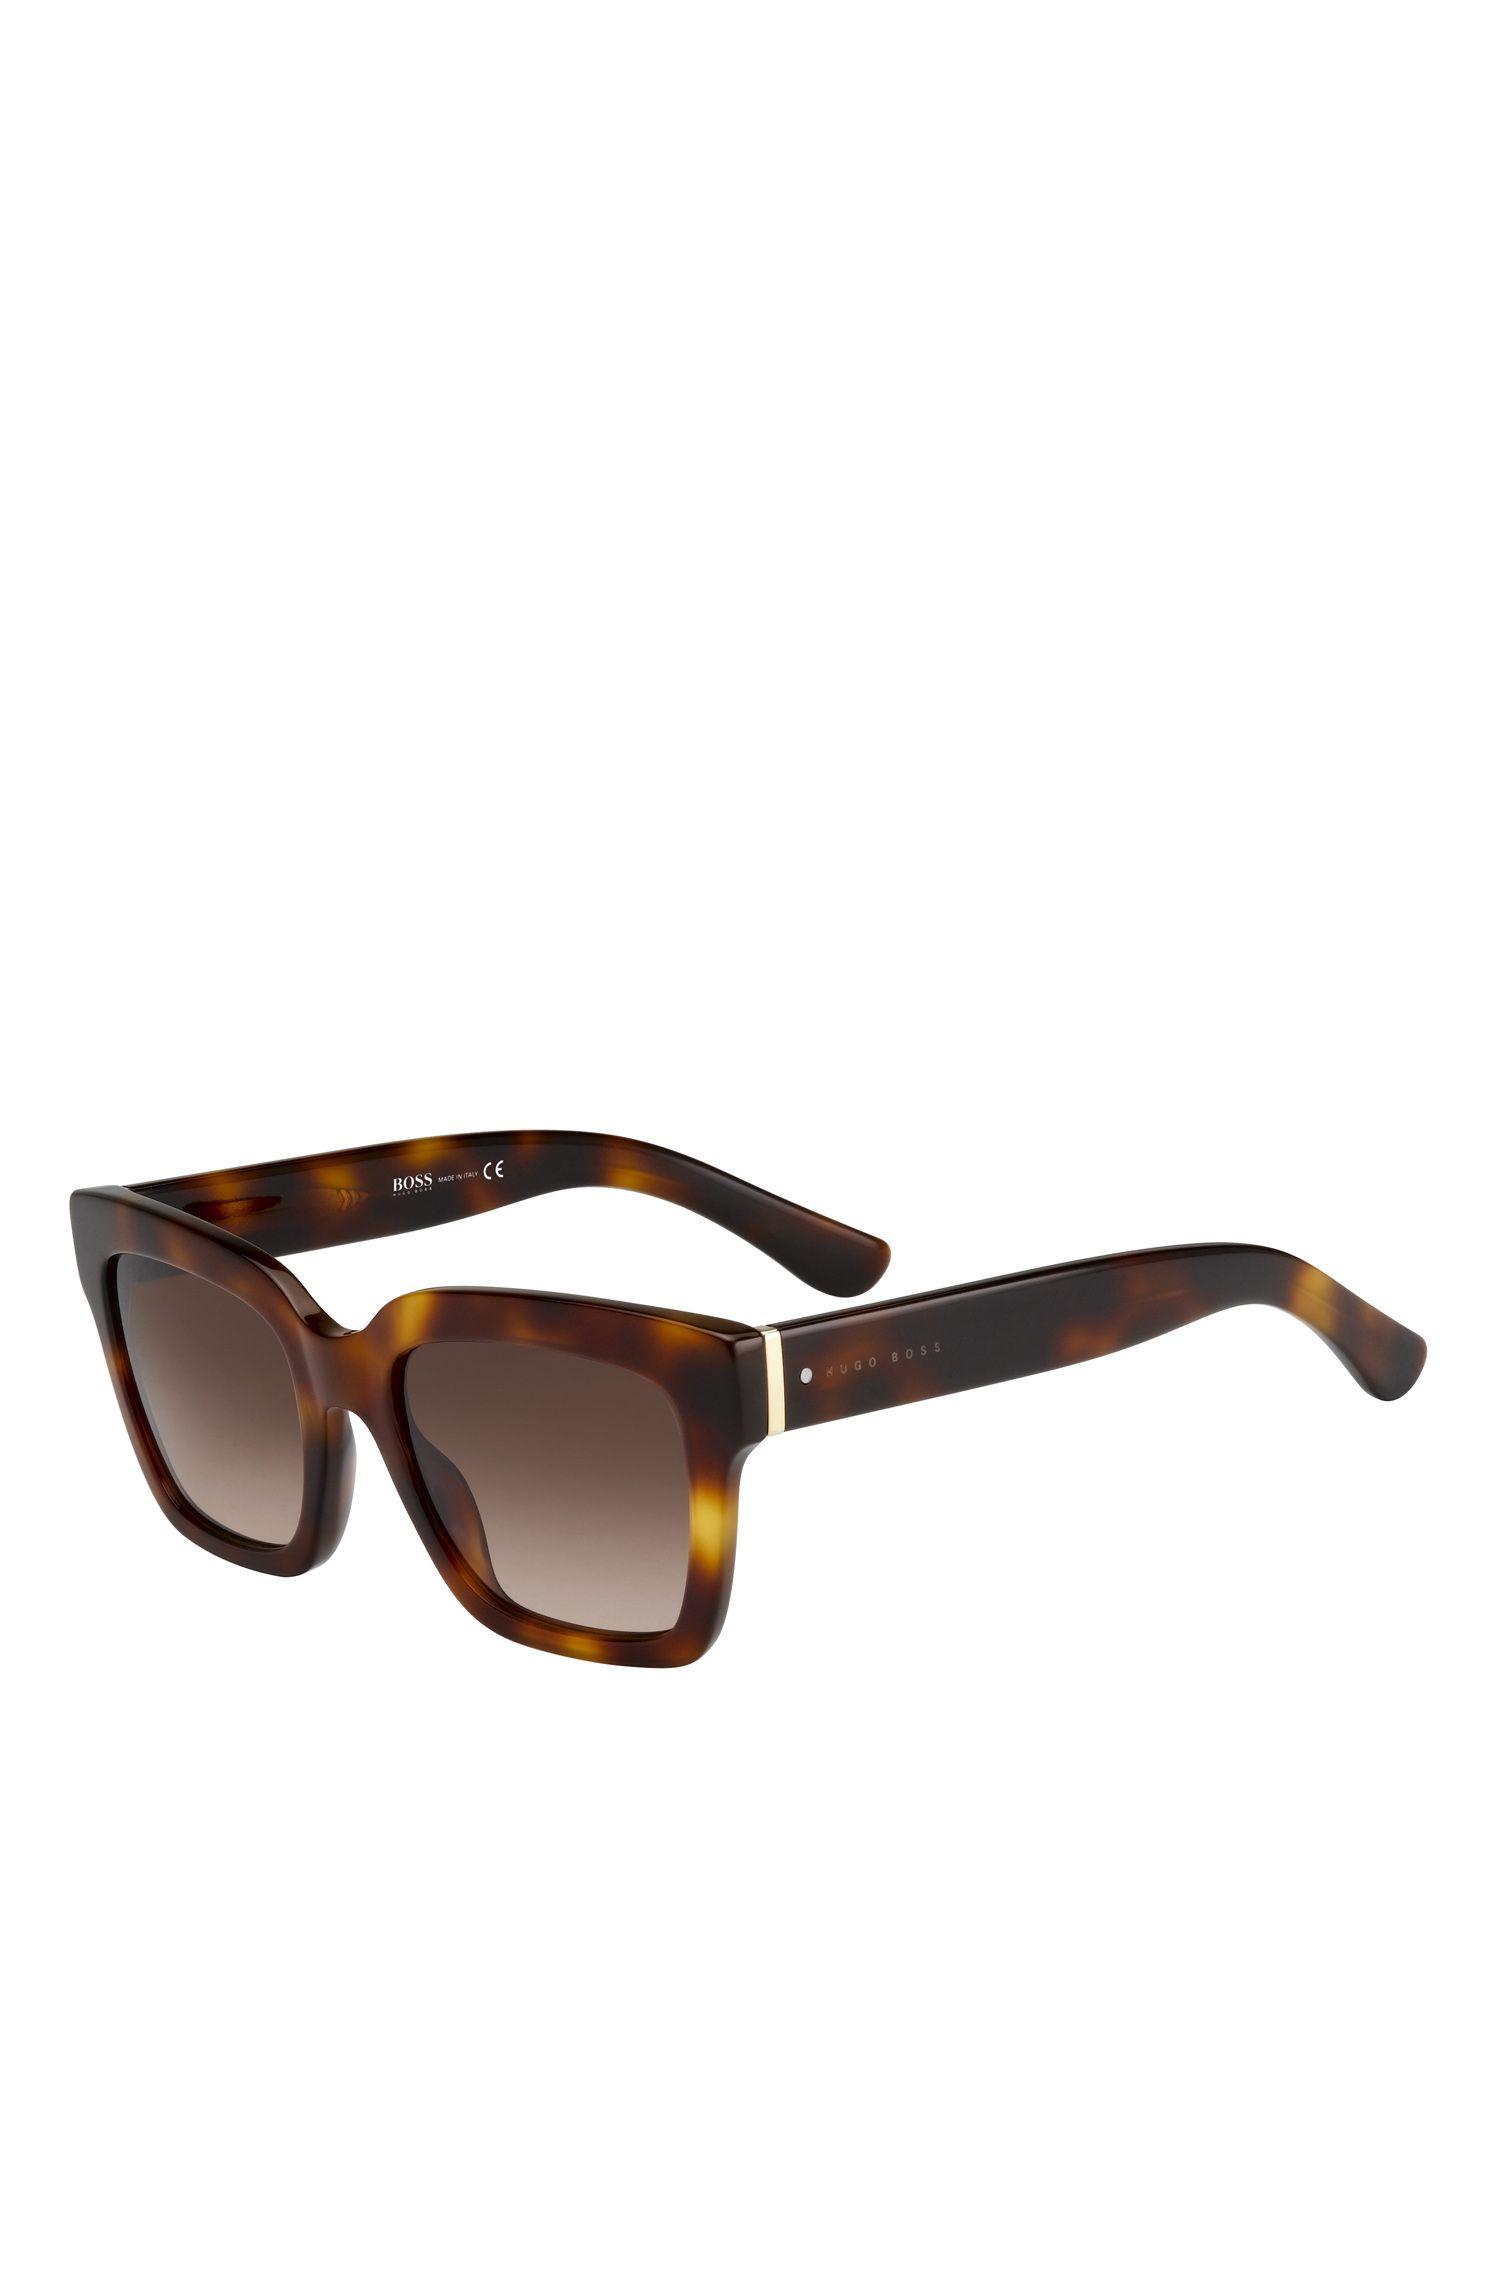 'BOSS 0674S' | Brown Gradient Lens Rectangular Sunglasses